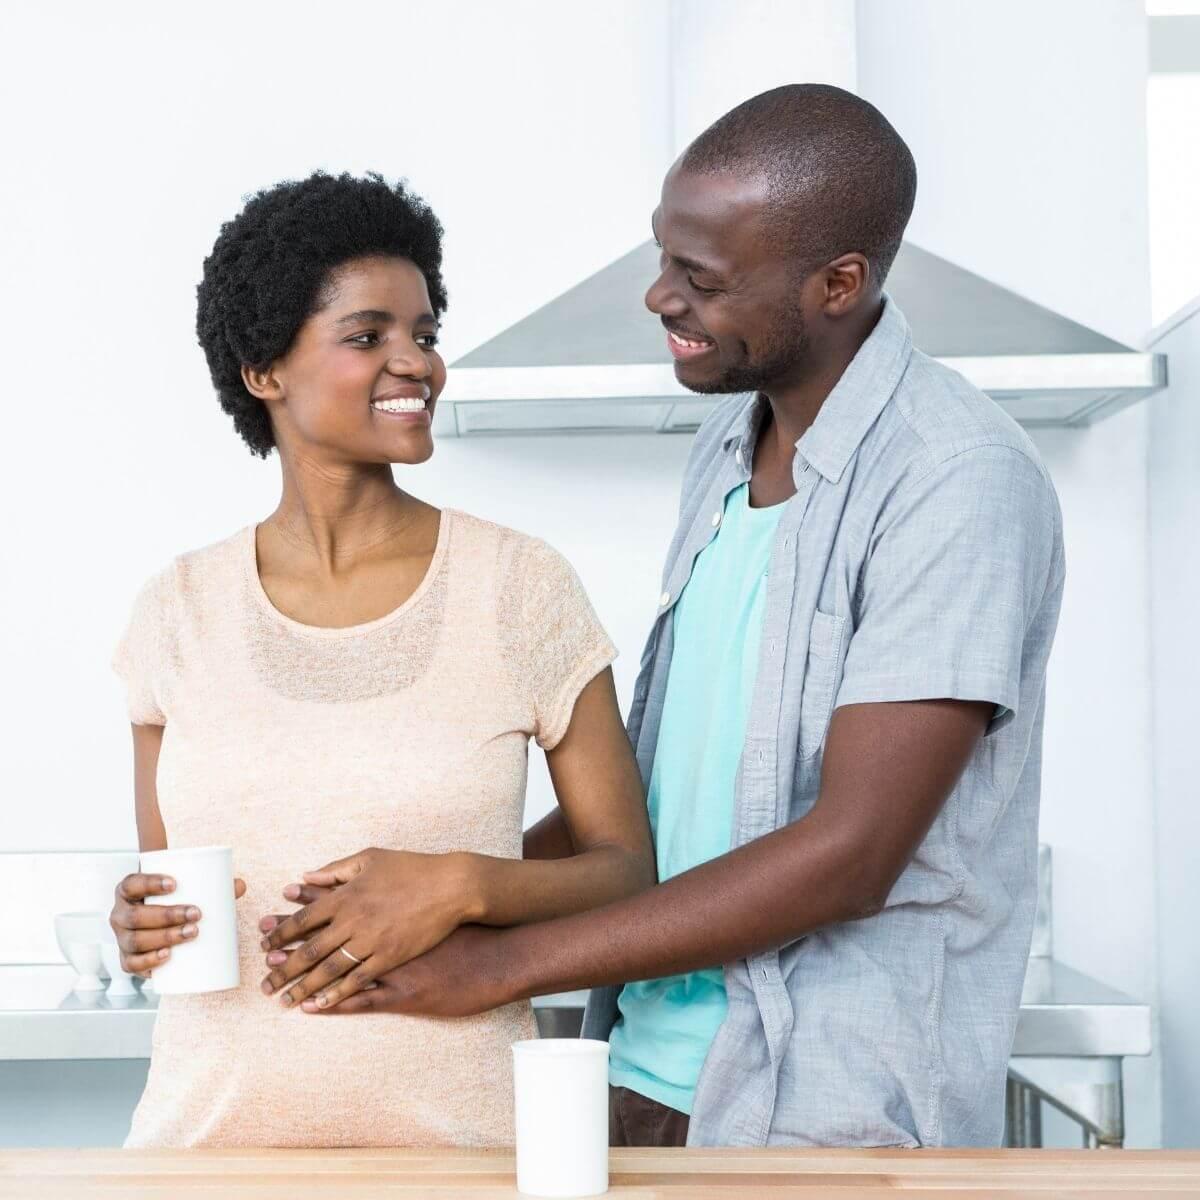 7 Weeks Pregnant BIPOC couple